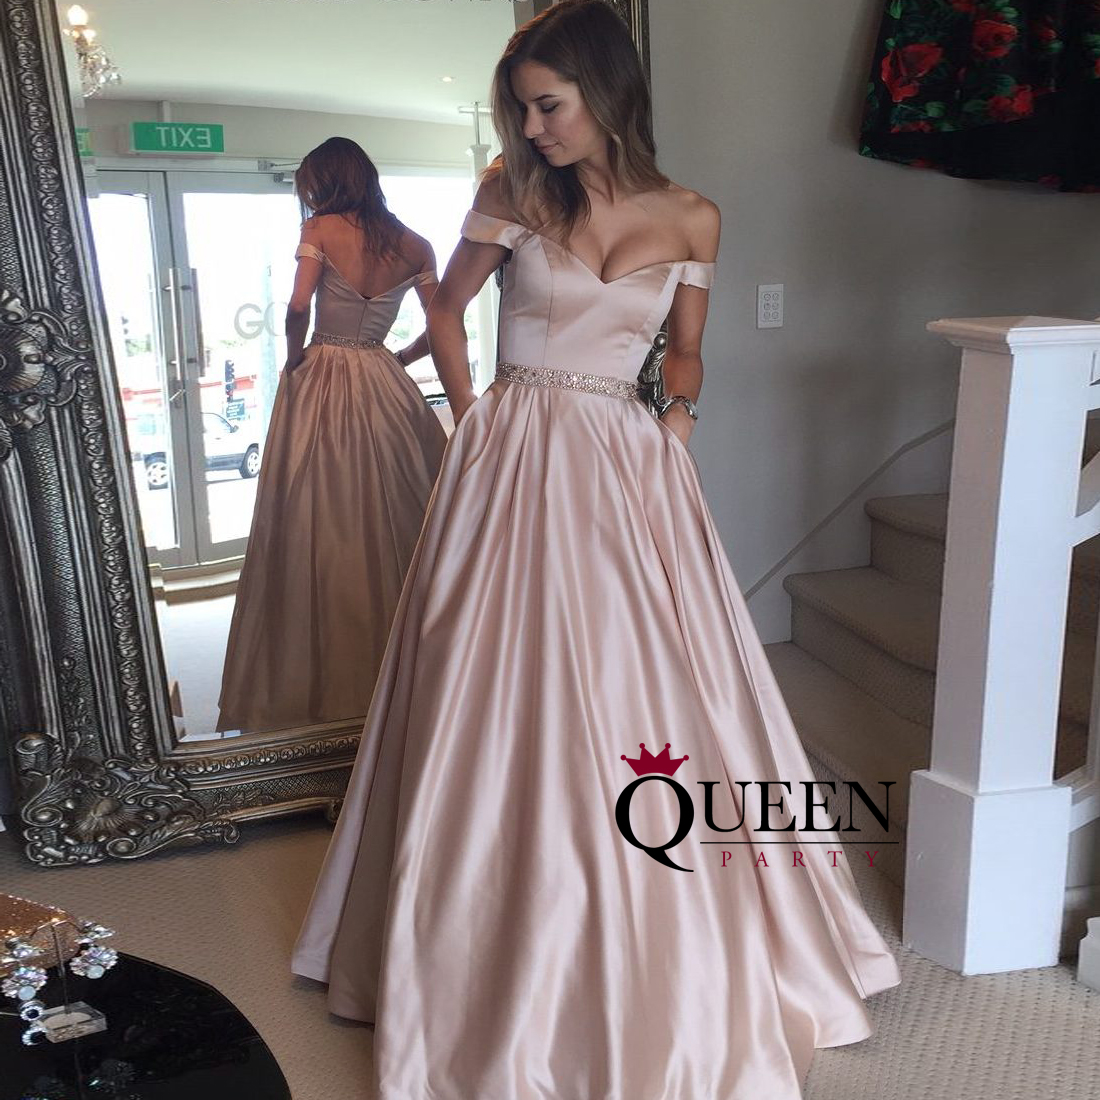 Champagne Satin Off-the-shoulder Embellished Waistline Ball Gown ...